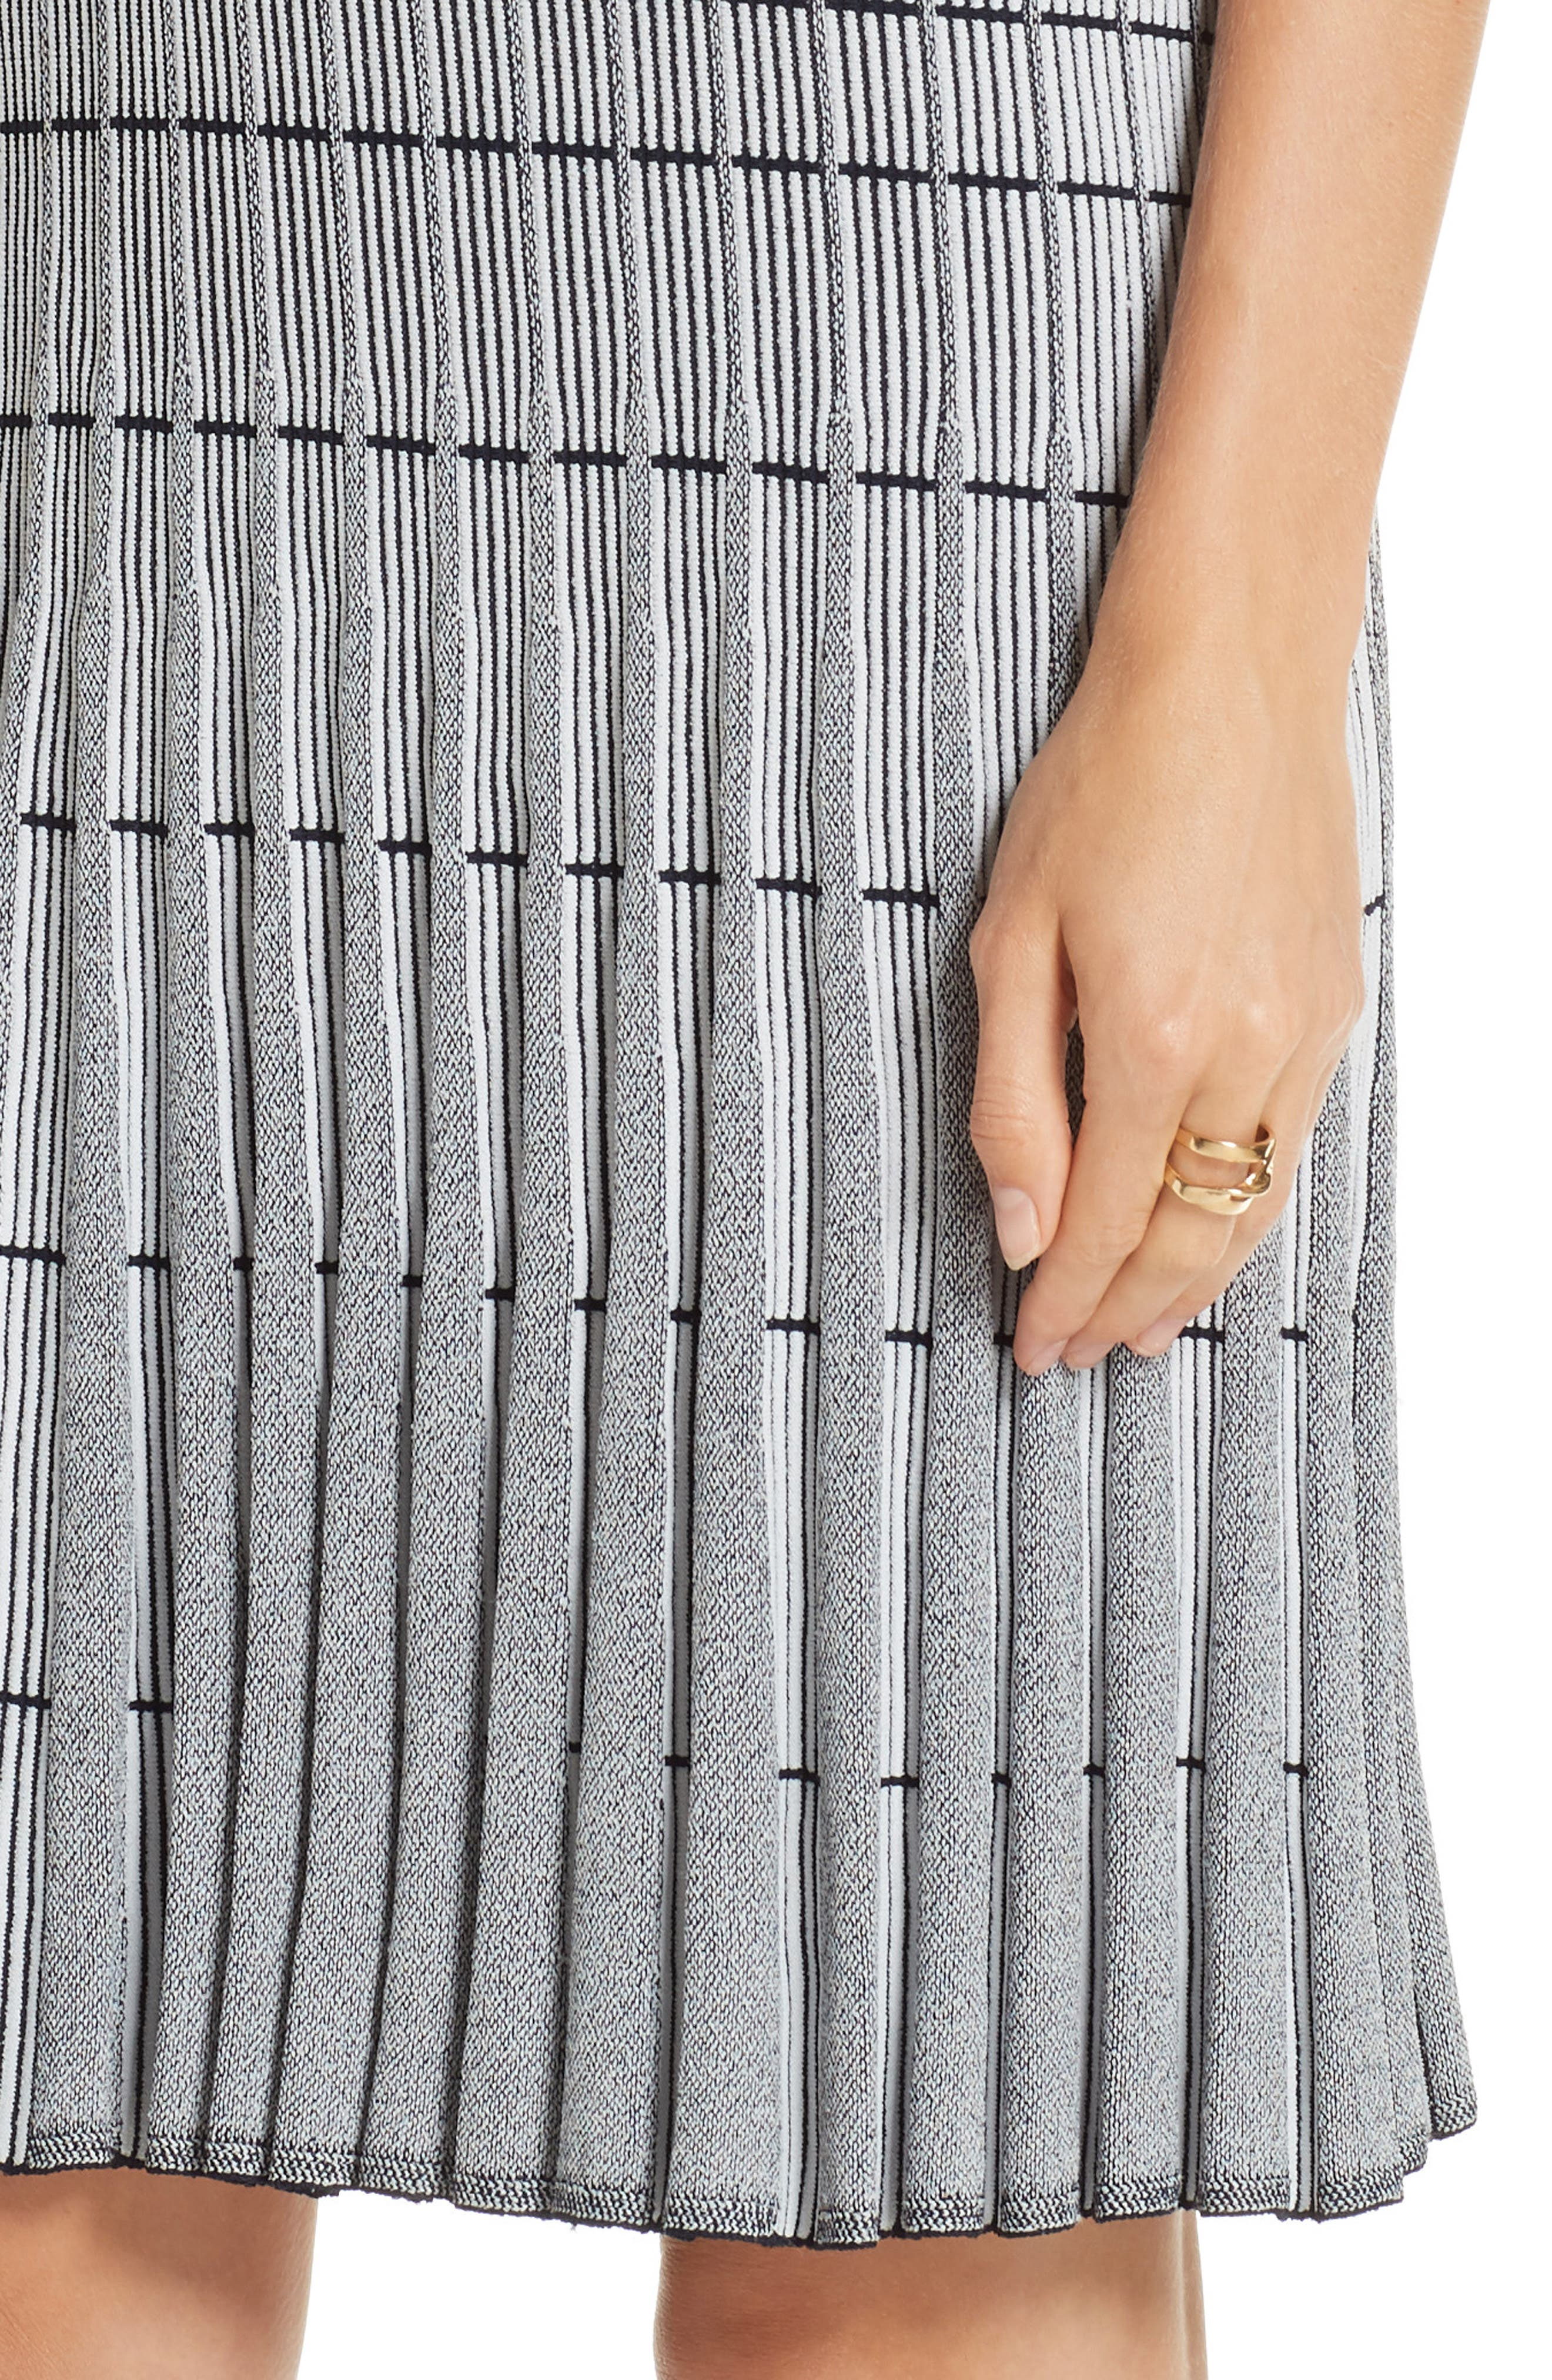 ST. JOHN COLLECTION, Monochrome Ottoman Knit Dress, Alternate thumbnail 6, color, GREY/ NAVY